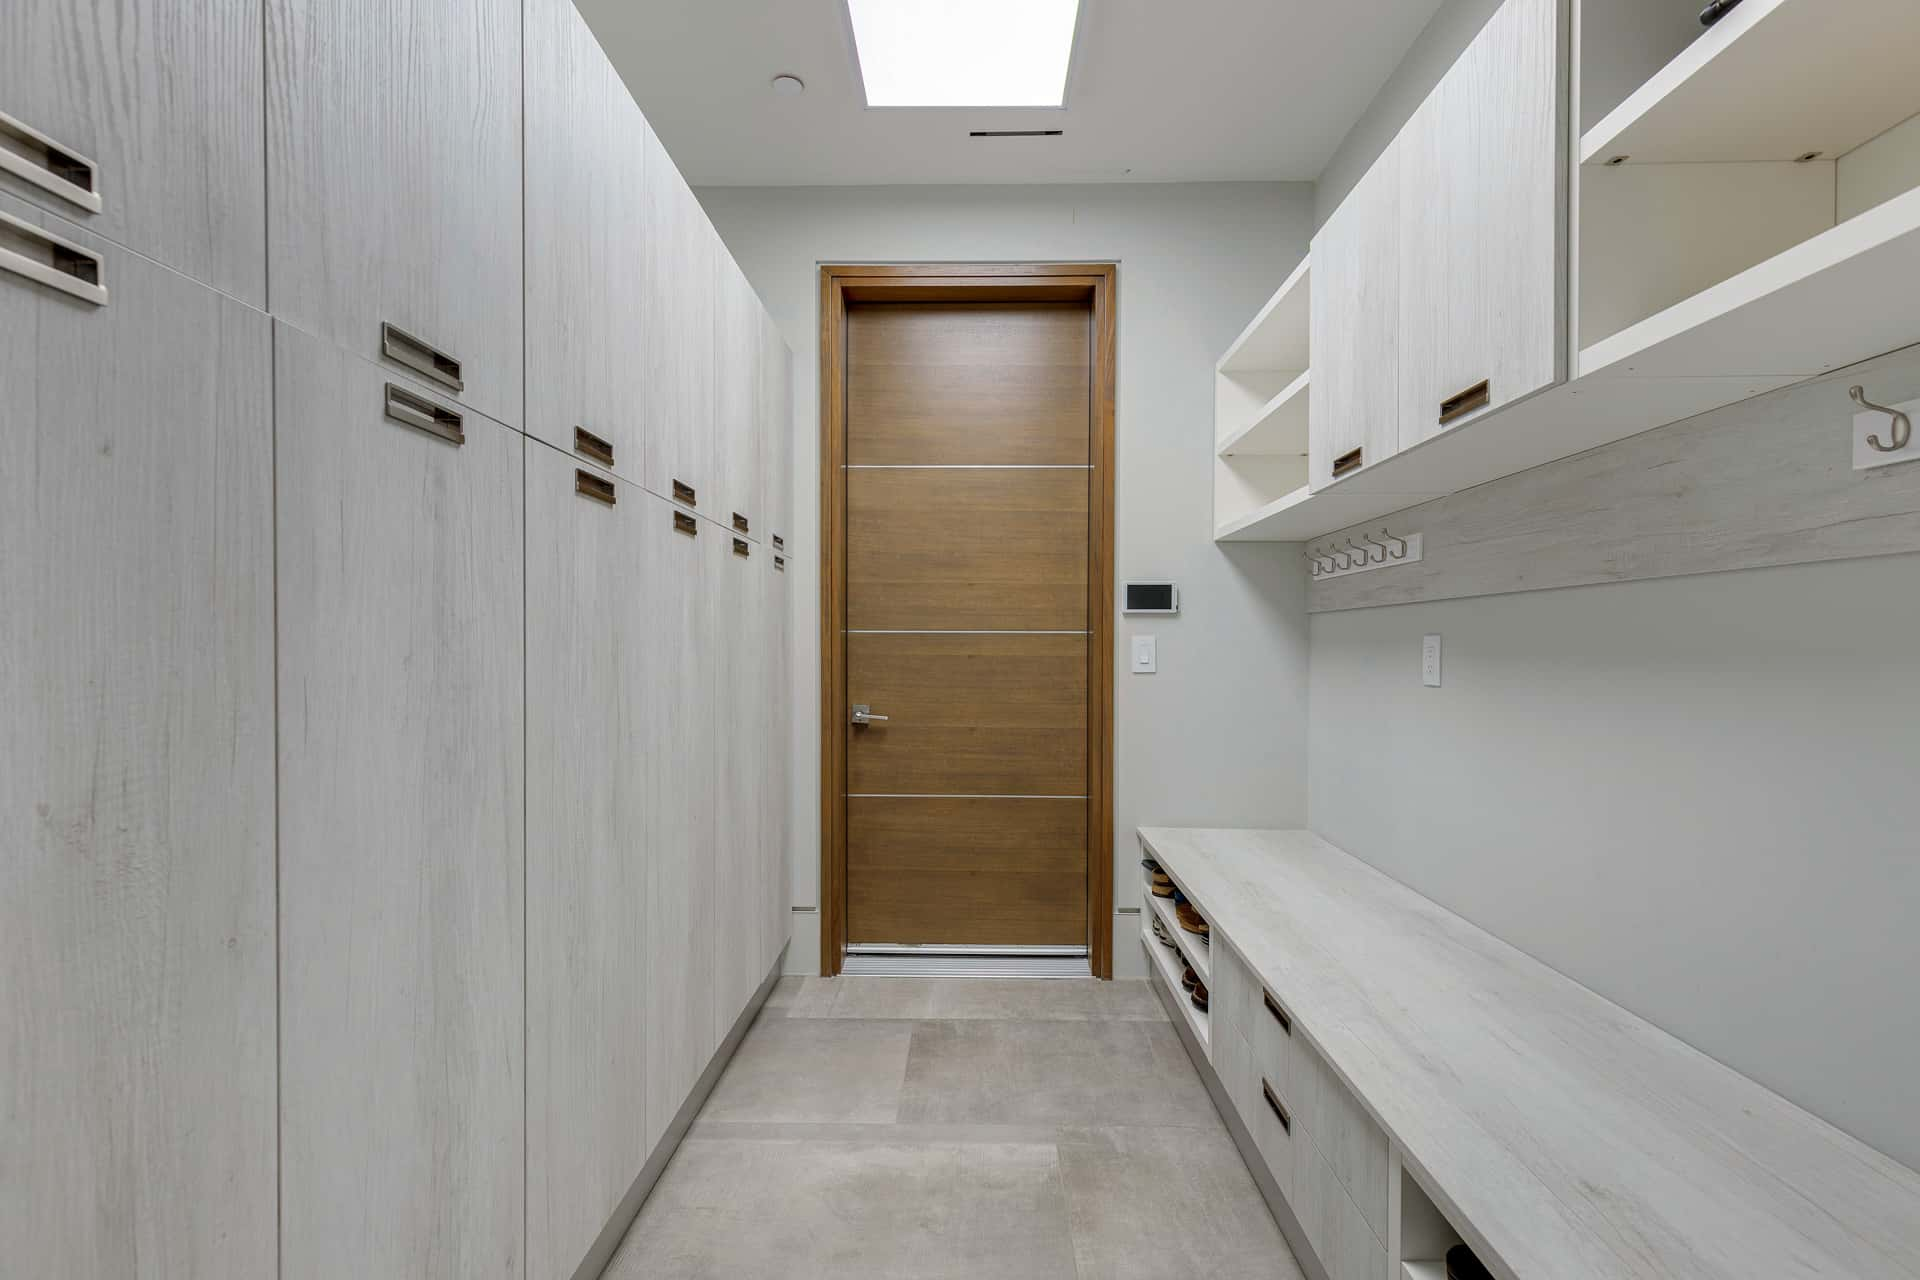 las-vegas-luxry-real-estate-realtor-rob-jensen-company-5-rockstream-drive-ascaya041